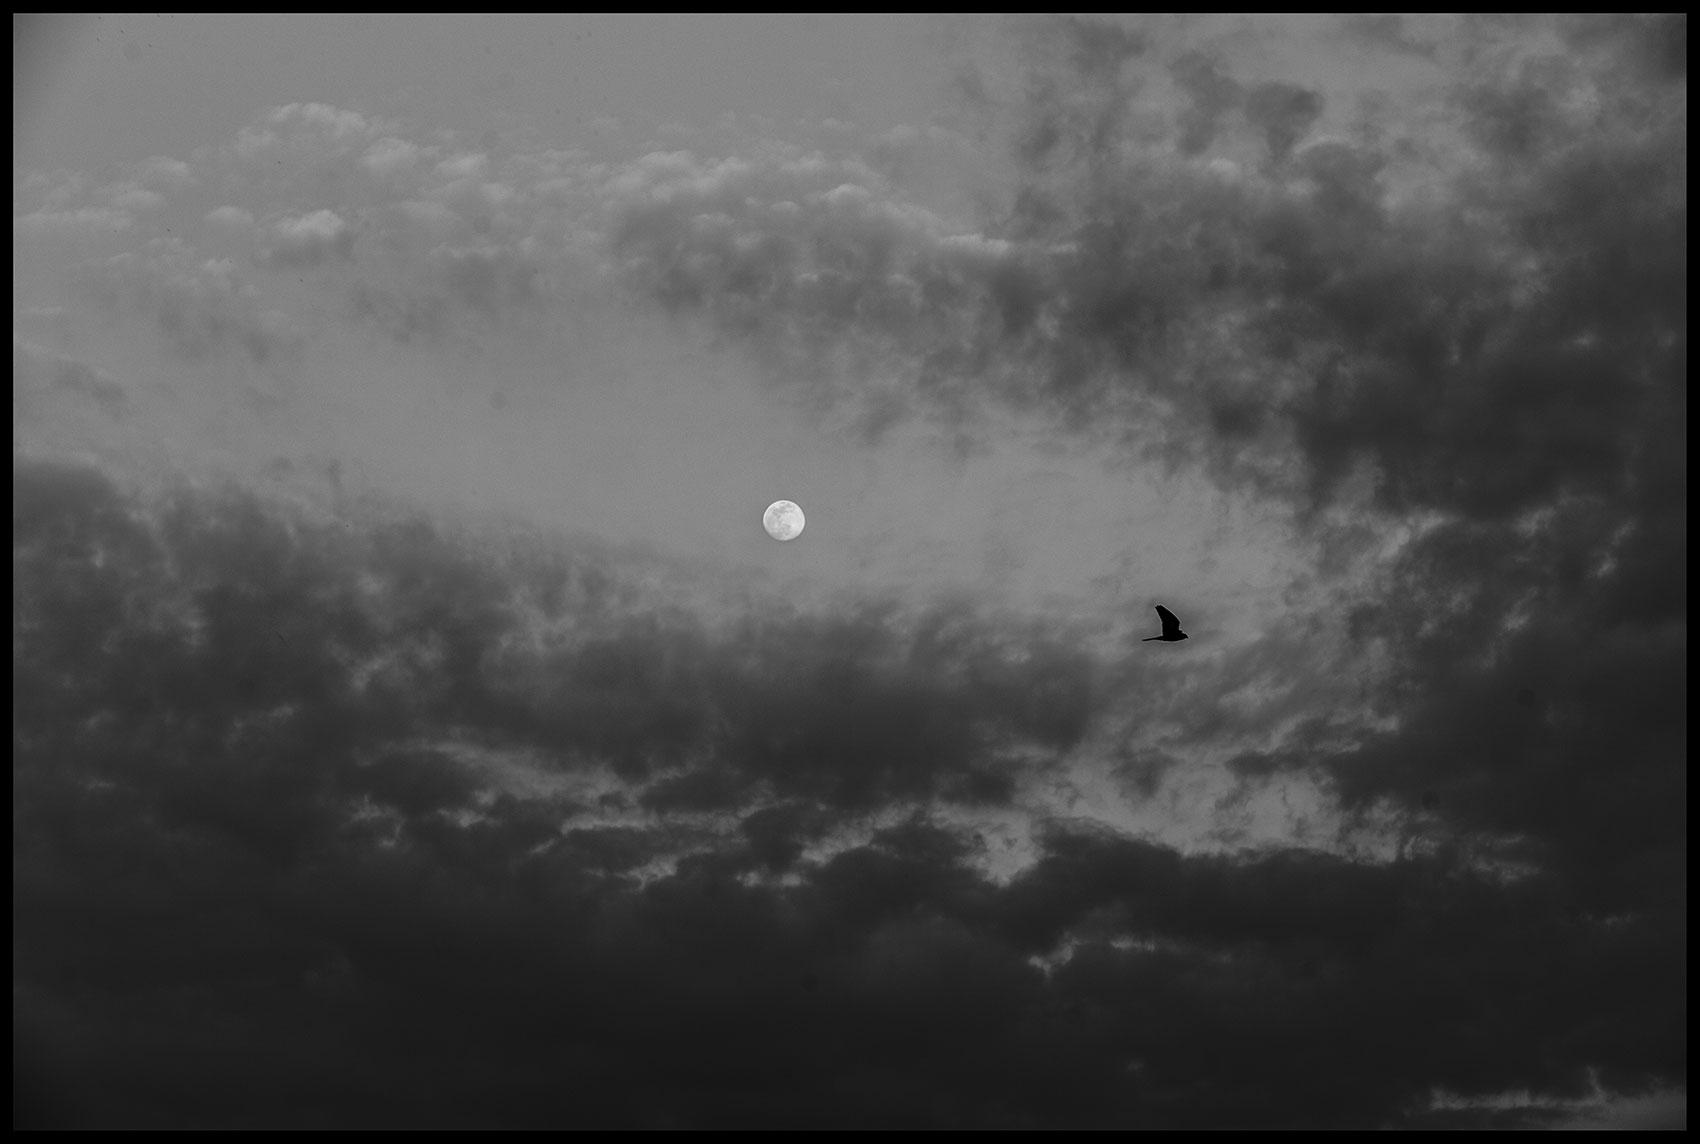 Yestarday's Moon 8/04/2020 | Album QUARANTINE | Stefano Paradiso - Photographer